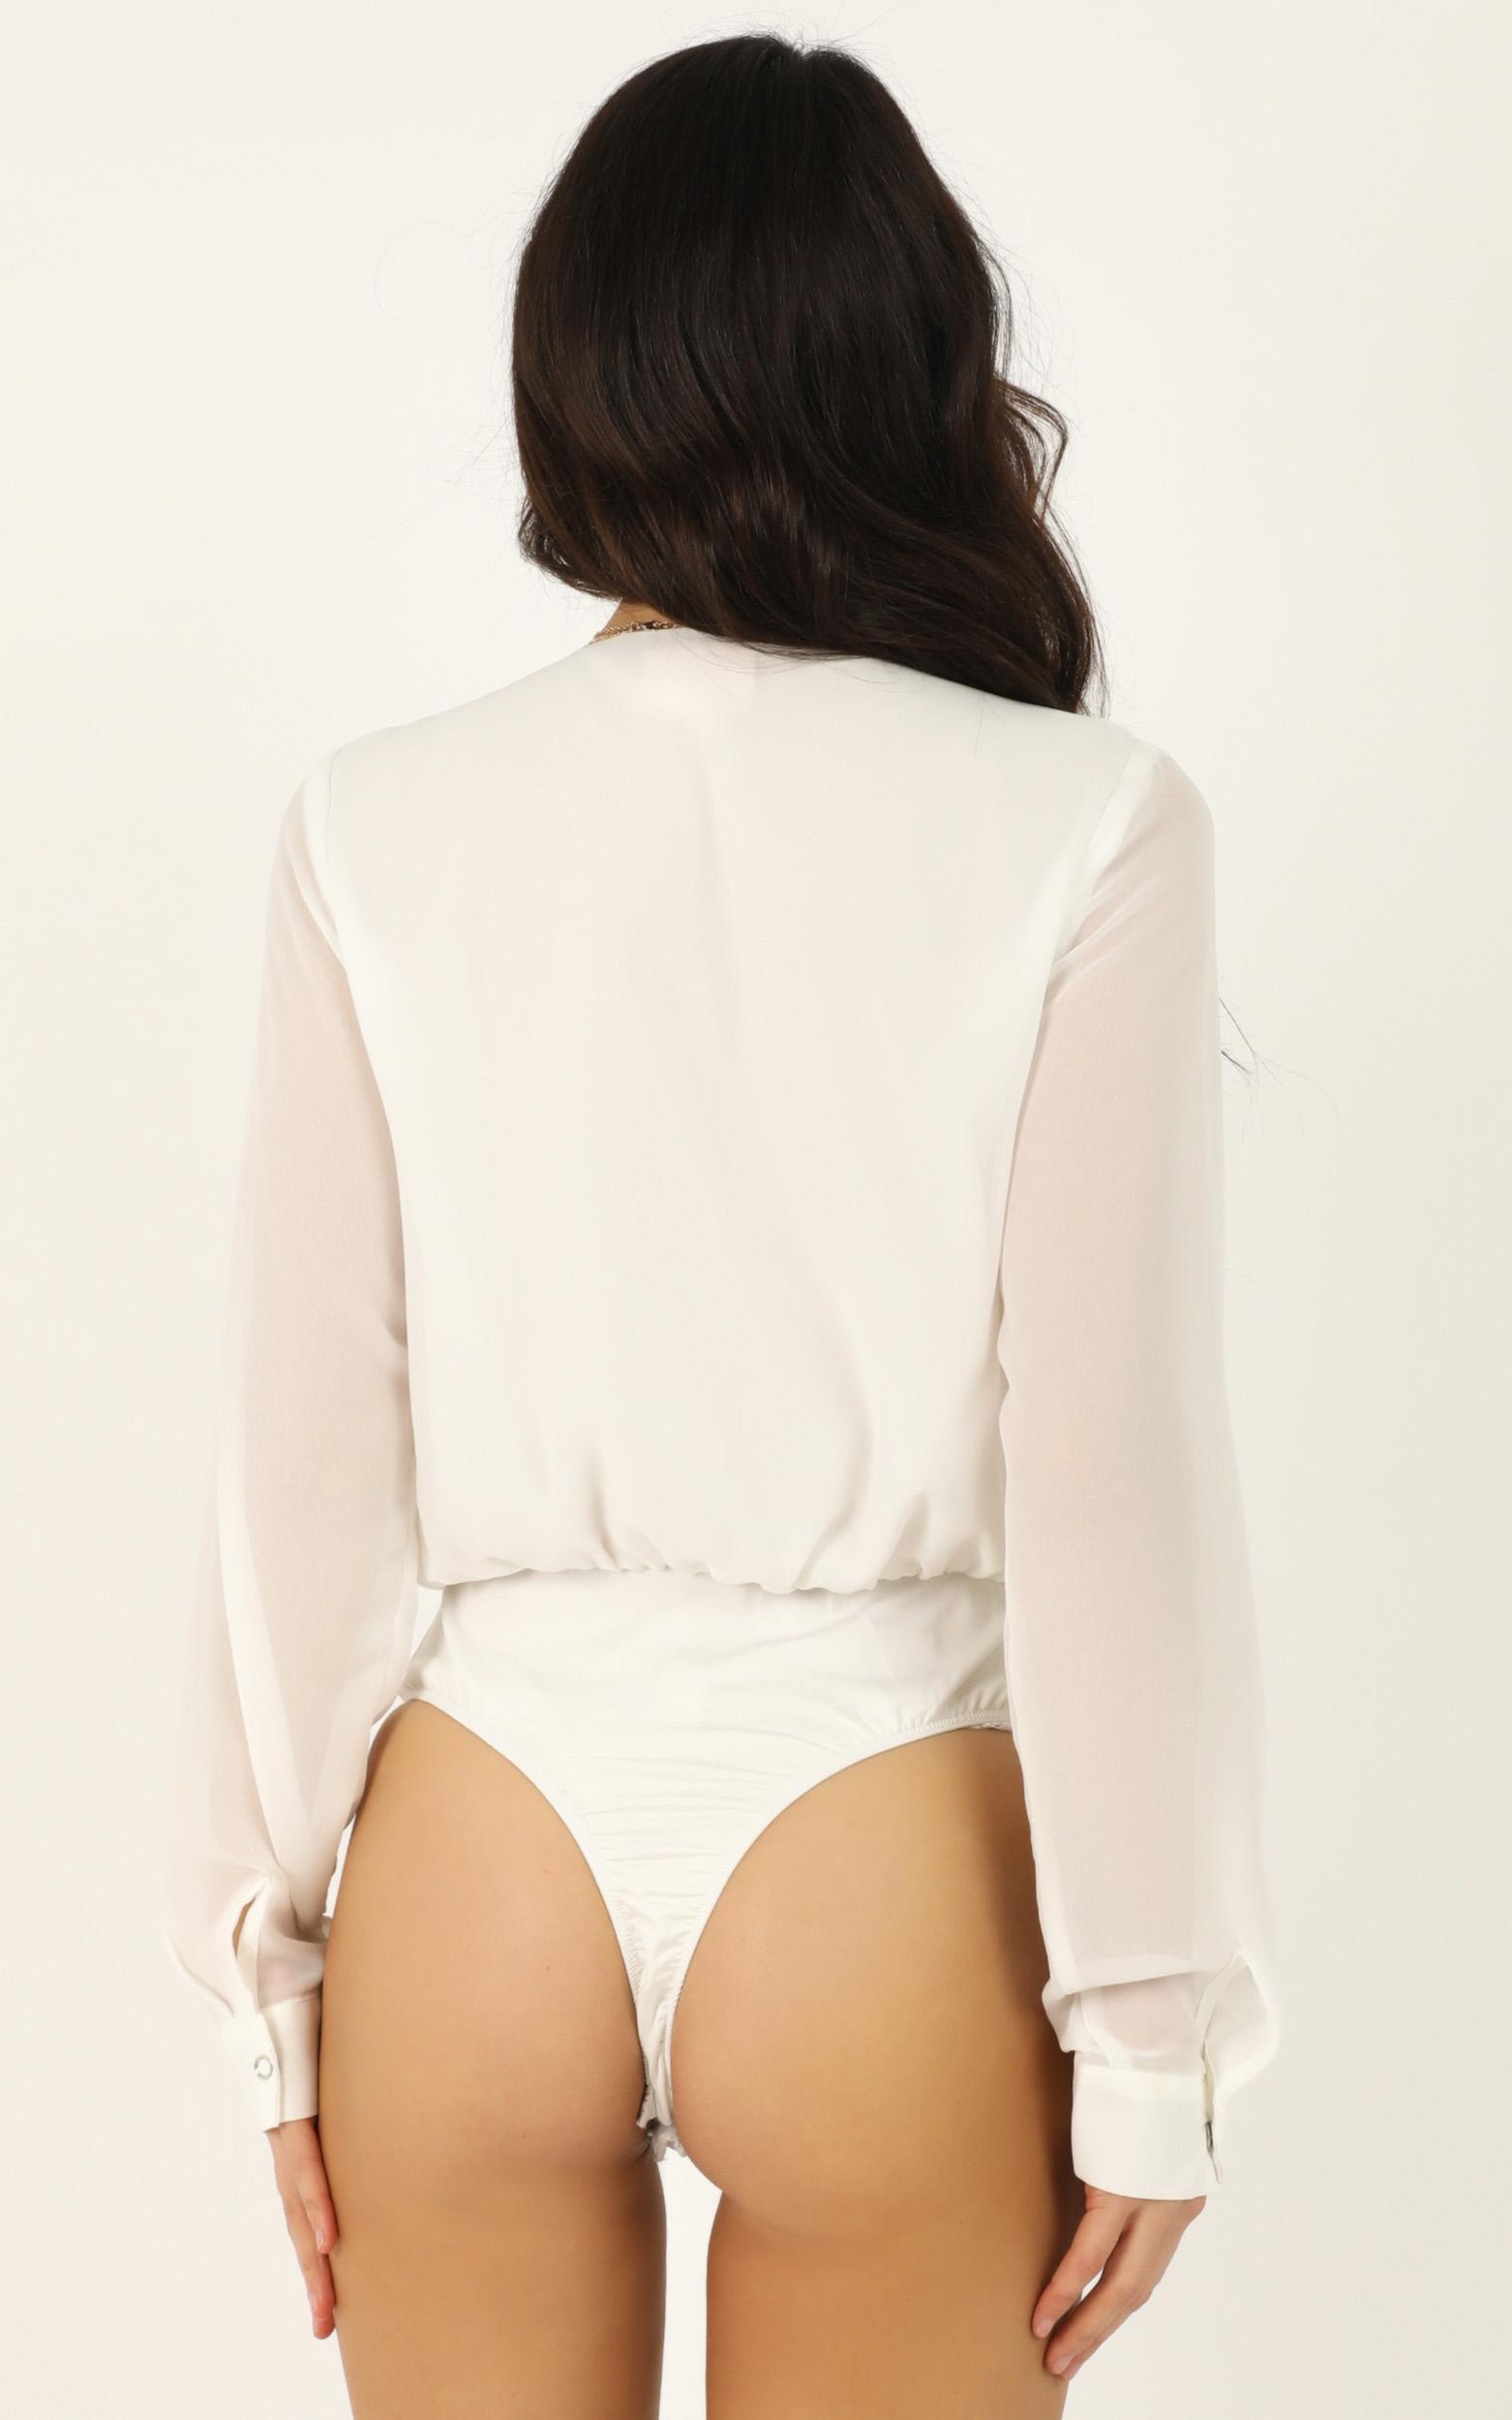 Still Ingrigued Bodysuit In white - 12 (L), White, hi-res image number null